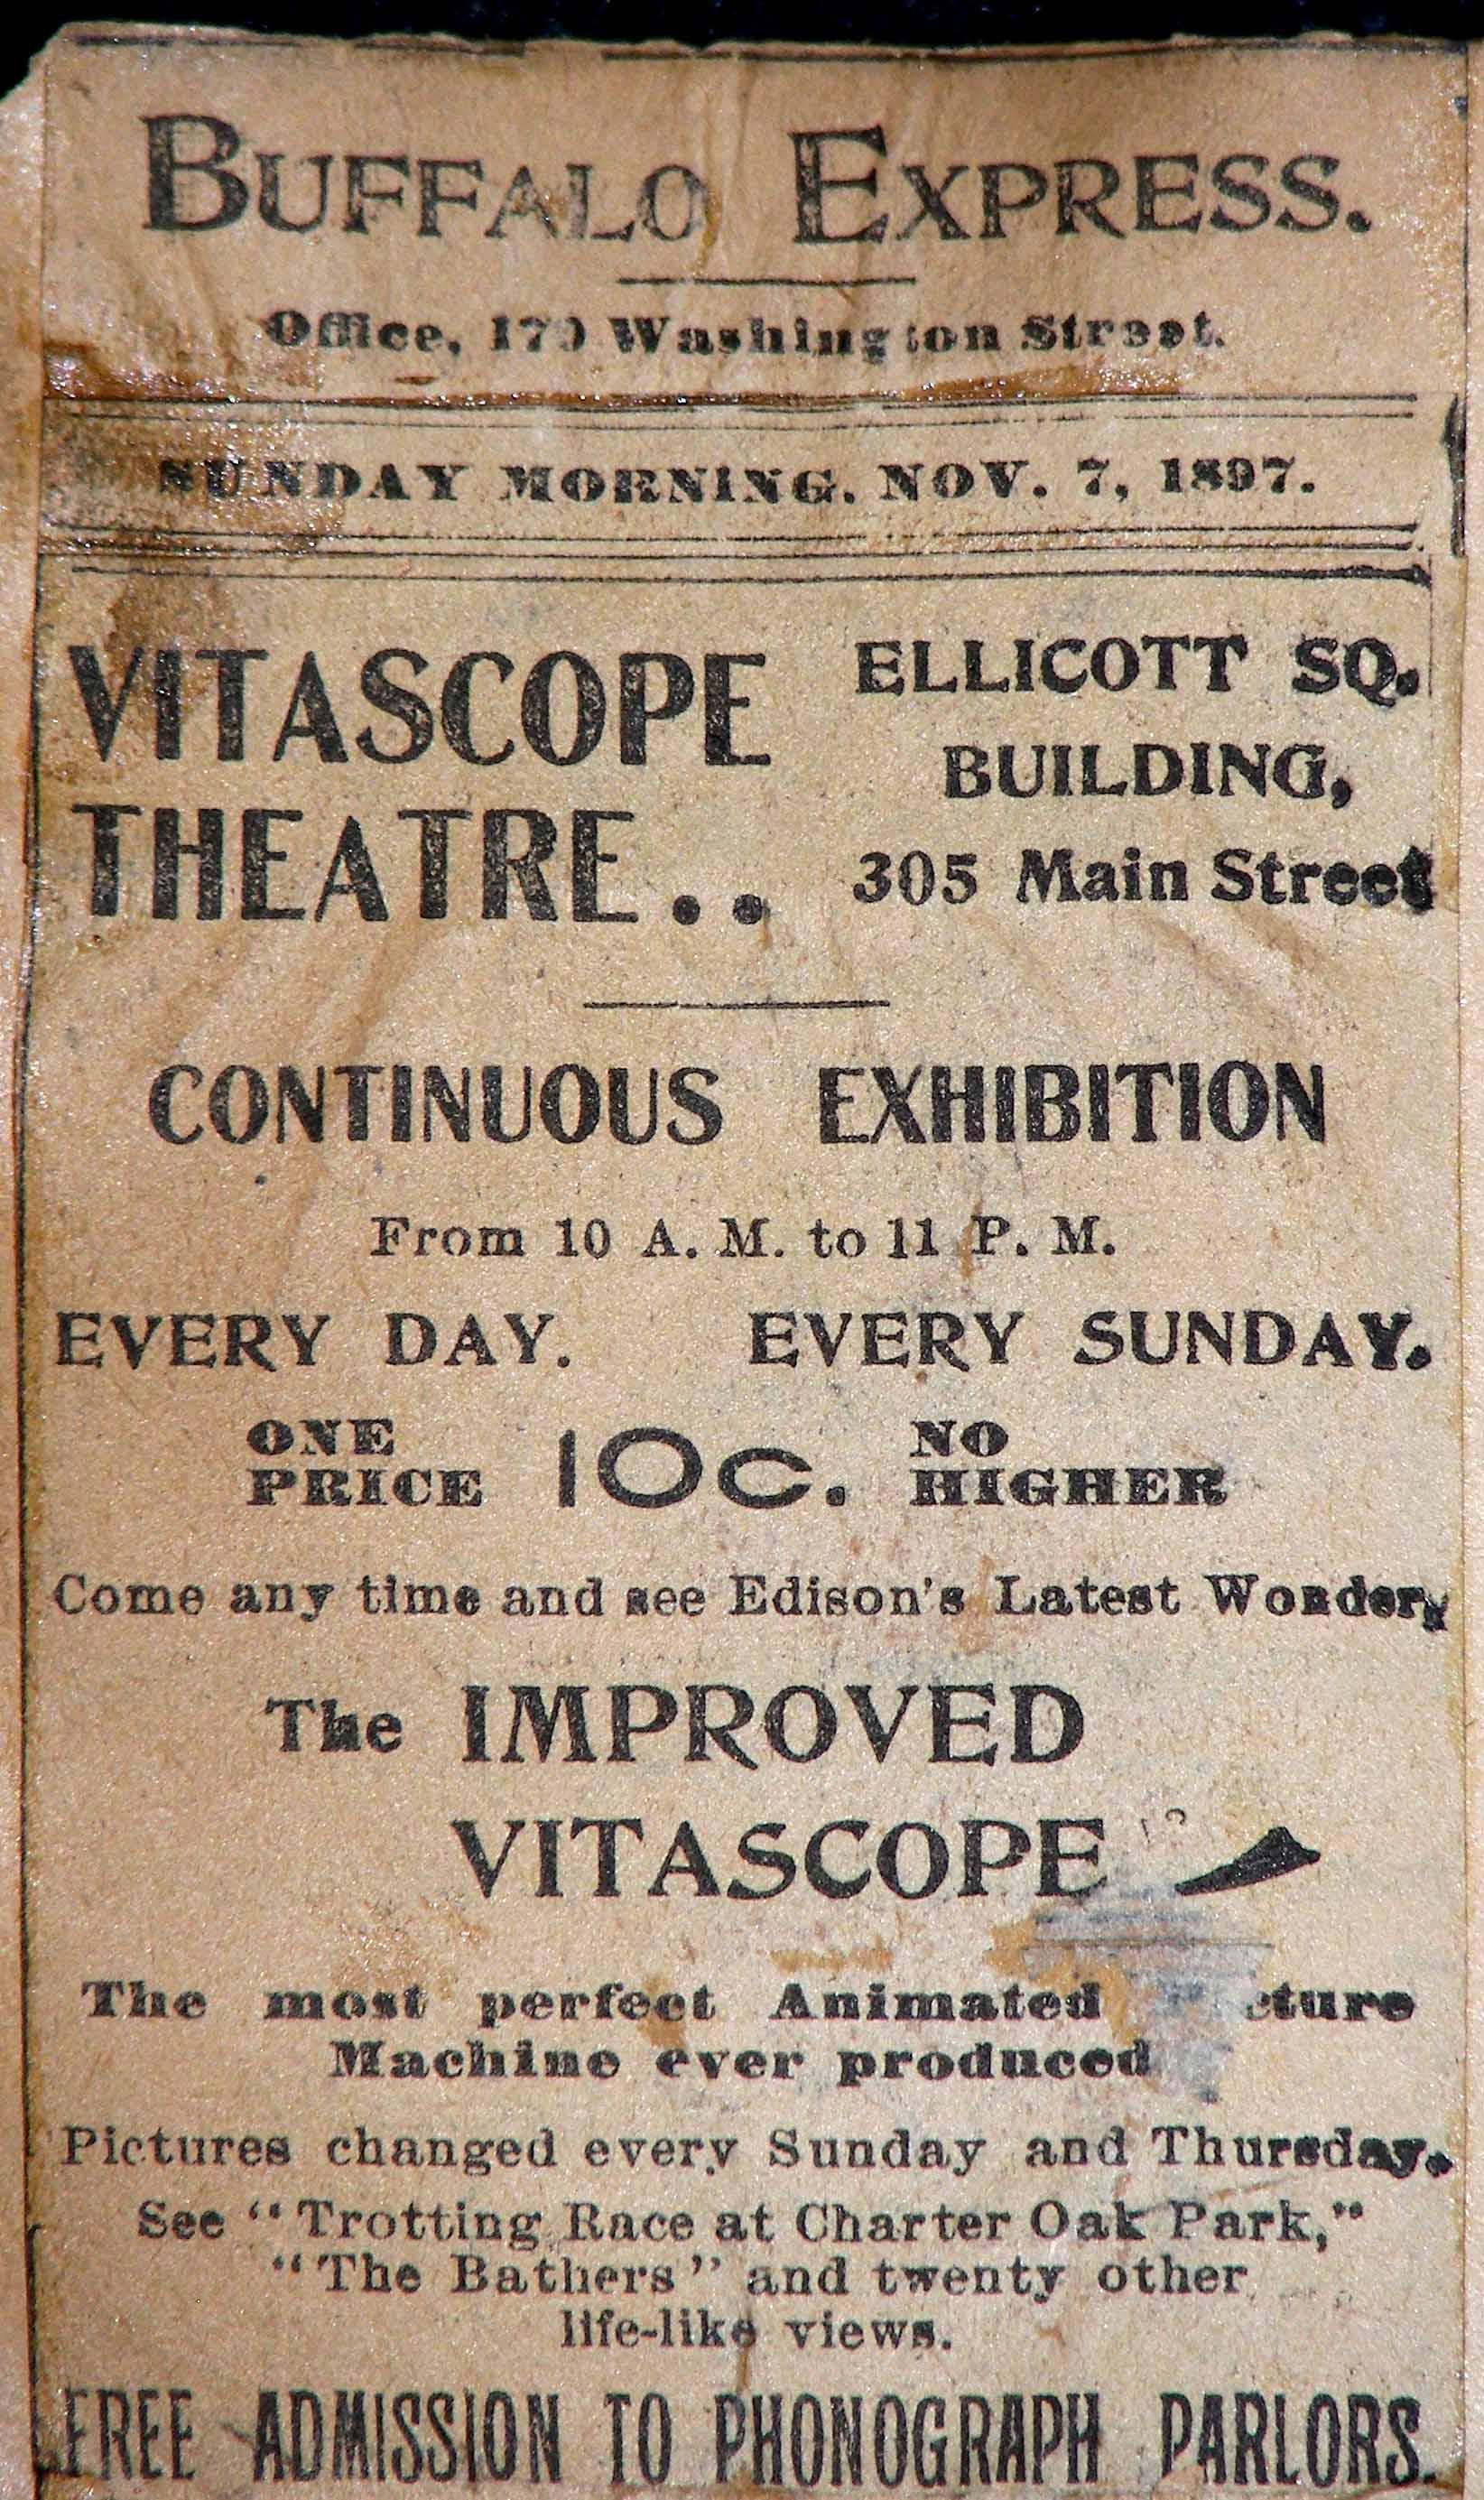 Vitascope Theater Buffalo Nov 1897 ad.jpg